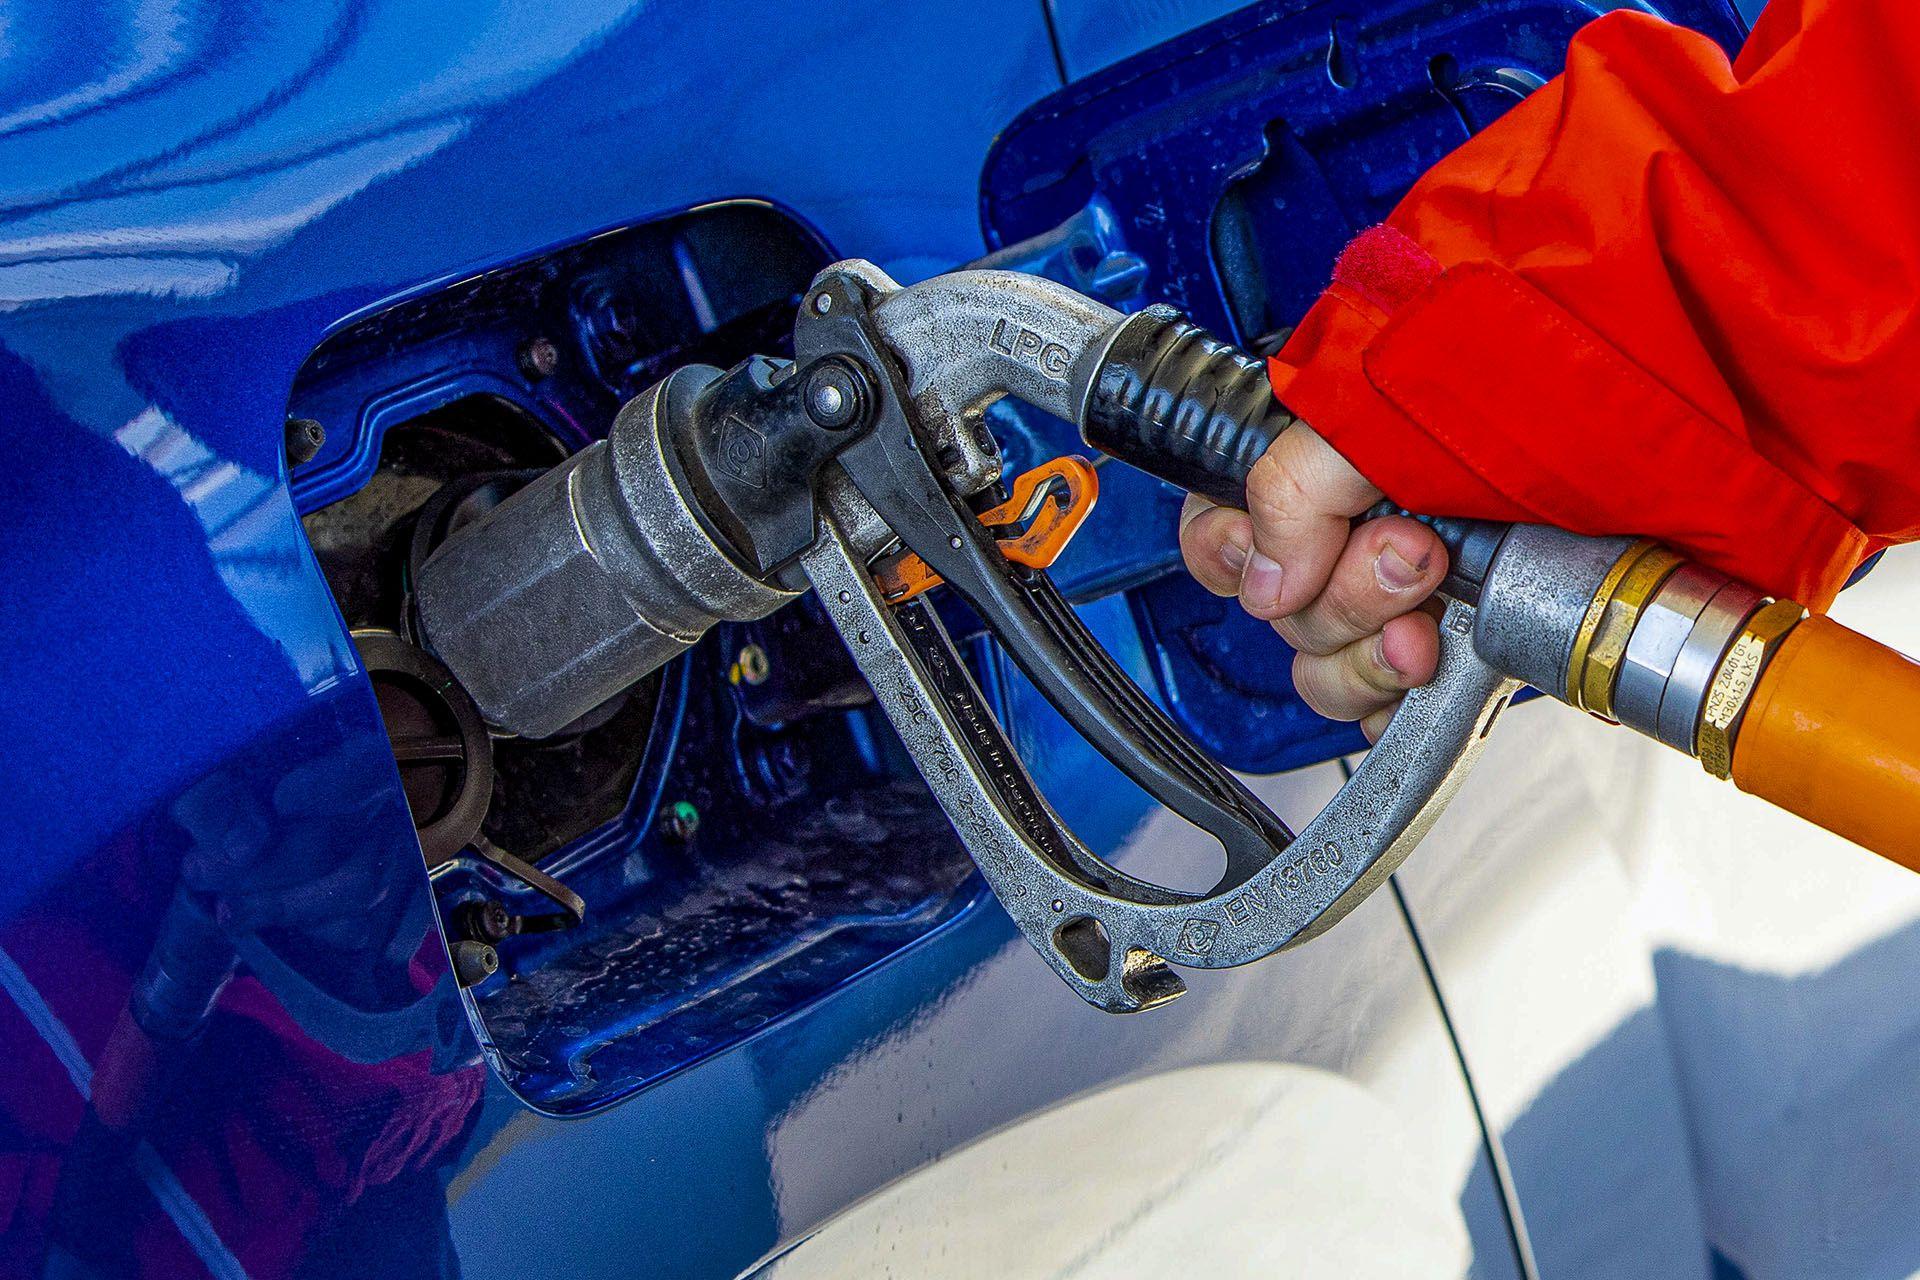 Dacia Duster 1.0 TCE 100 LPG test – tankowanie LPG